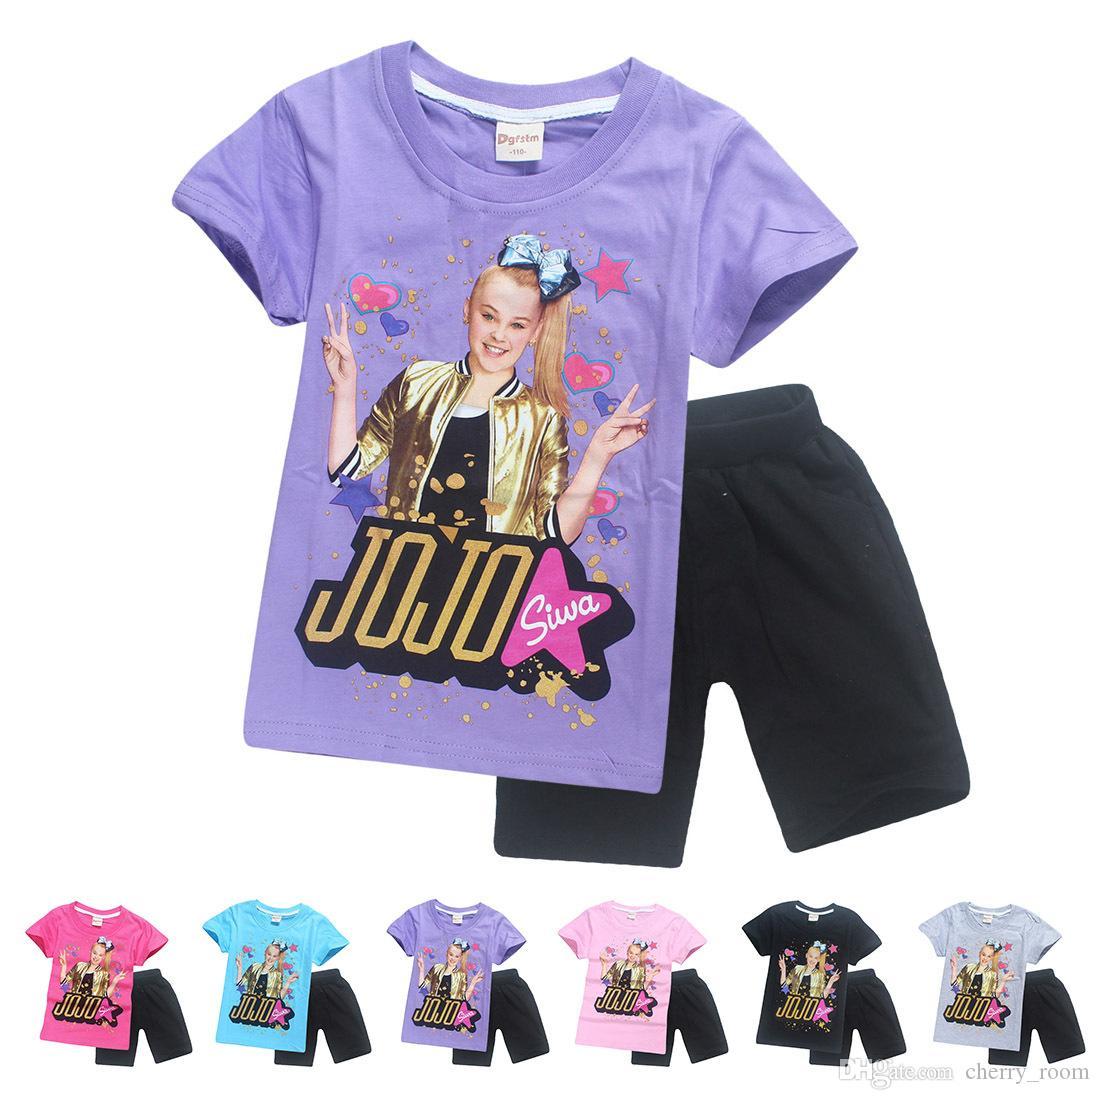 Jojo Siwa Children Shorts Outfits 2018 New Cartoon Short Sleeves Jojo Inspired Kids Clothing Sets Fashion Summer Girl Clothes C3911